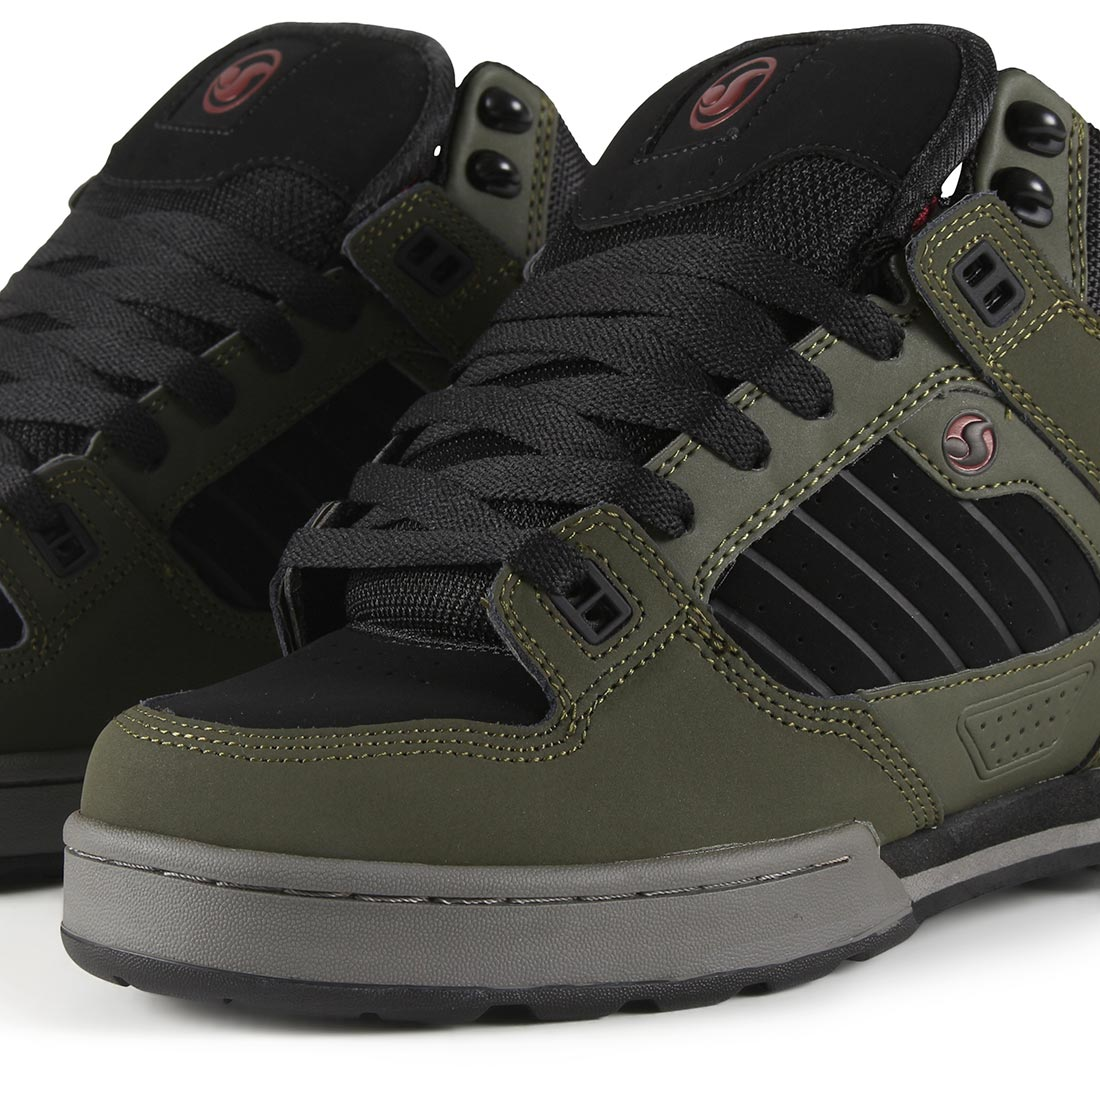 22d610e1ea5 DVS Militia Boot - Military Olive / Black